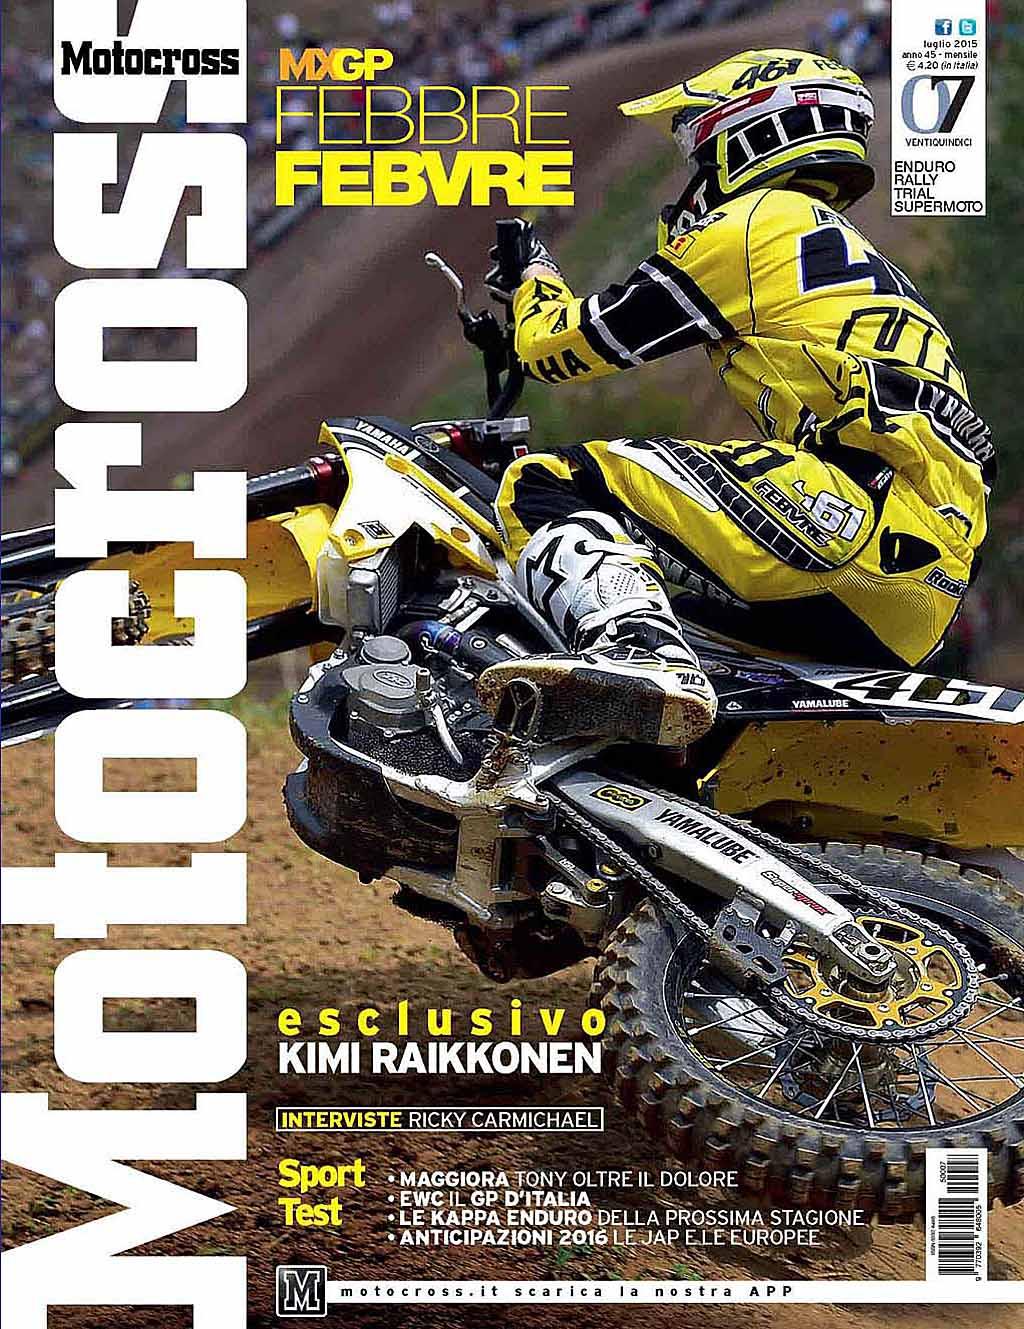 Motocross Luglio 2015